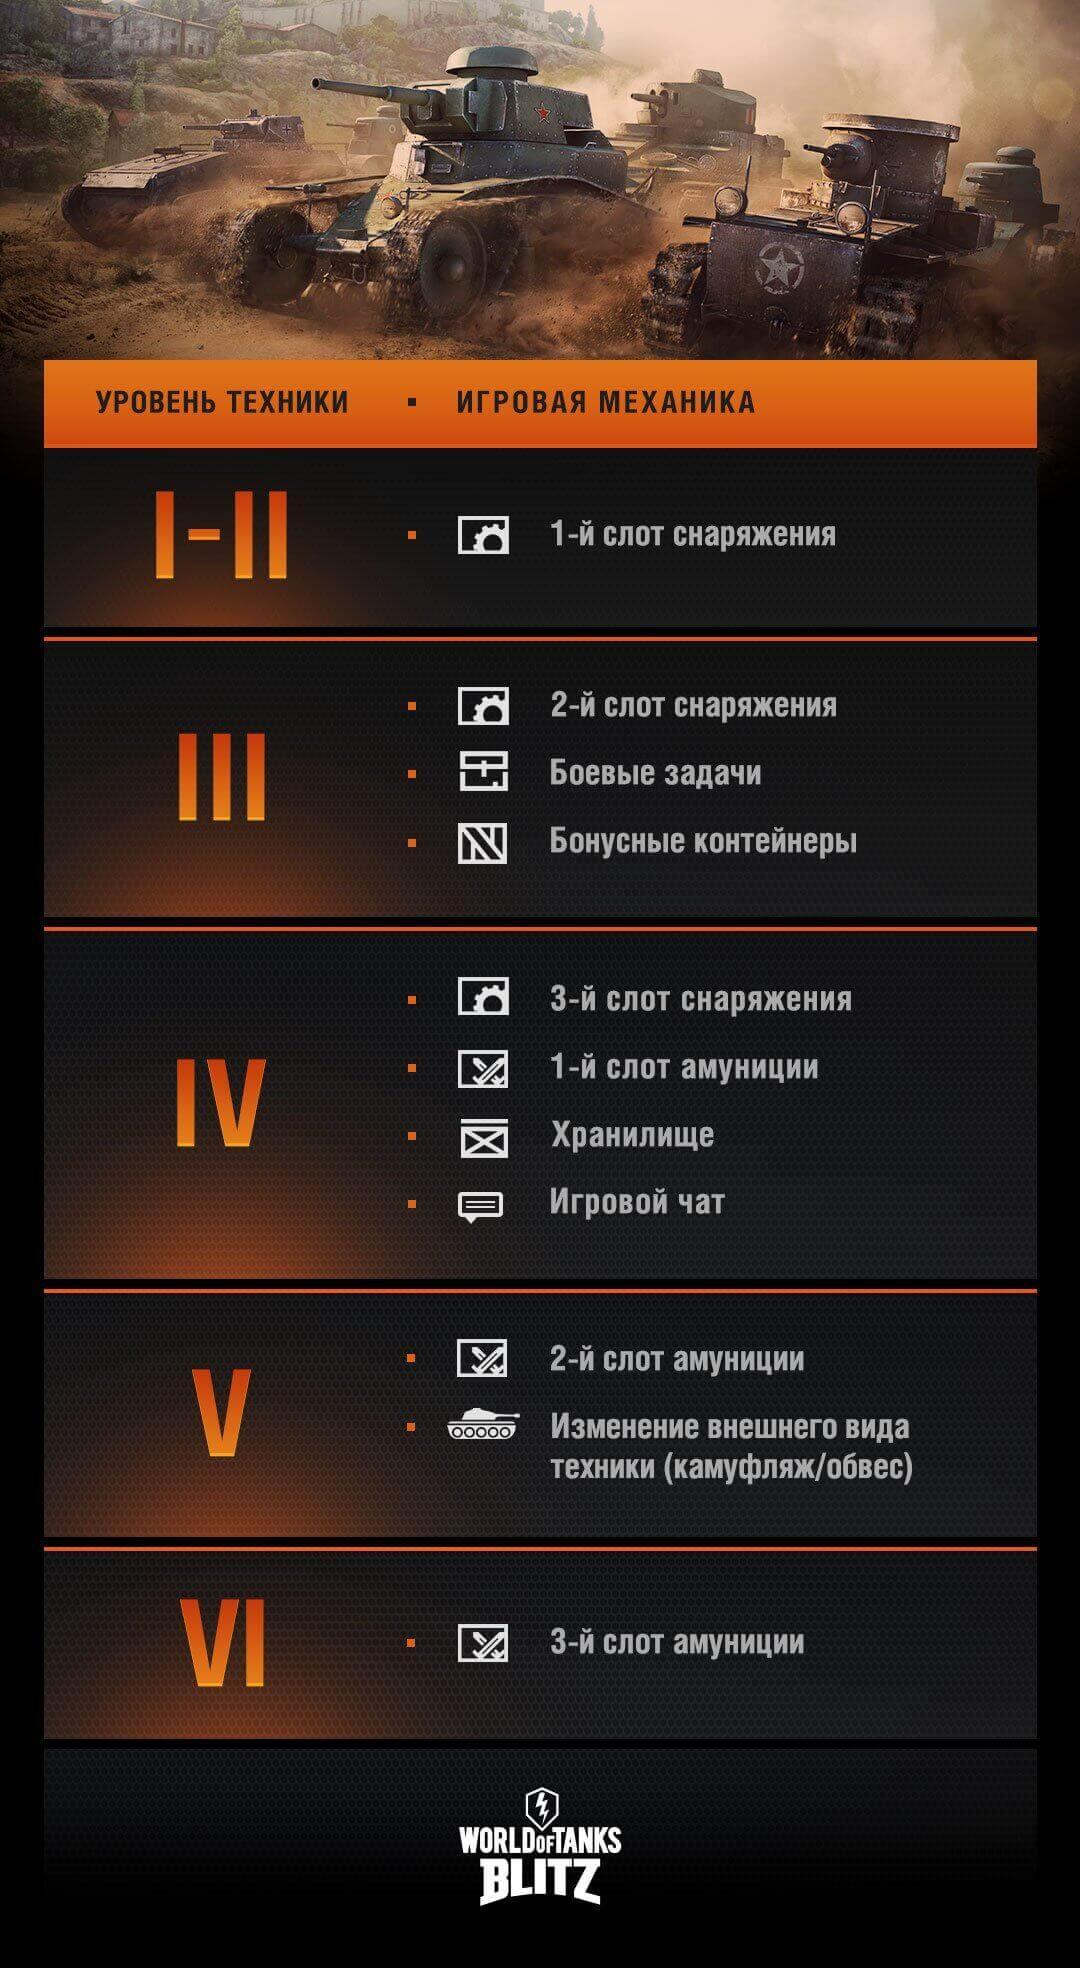 content-unlock-inf-ru.jpg__1080x1968_q85_crop_subsampling-2_upscale